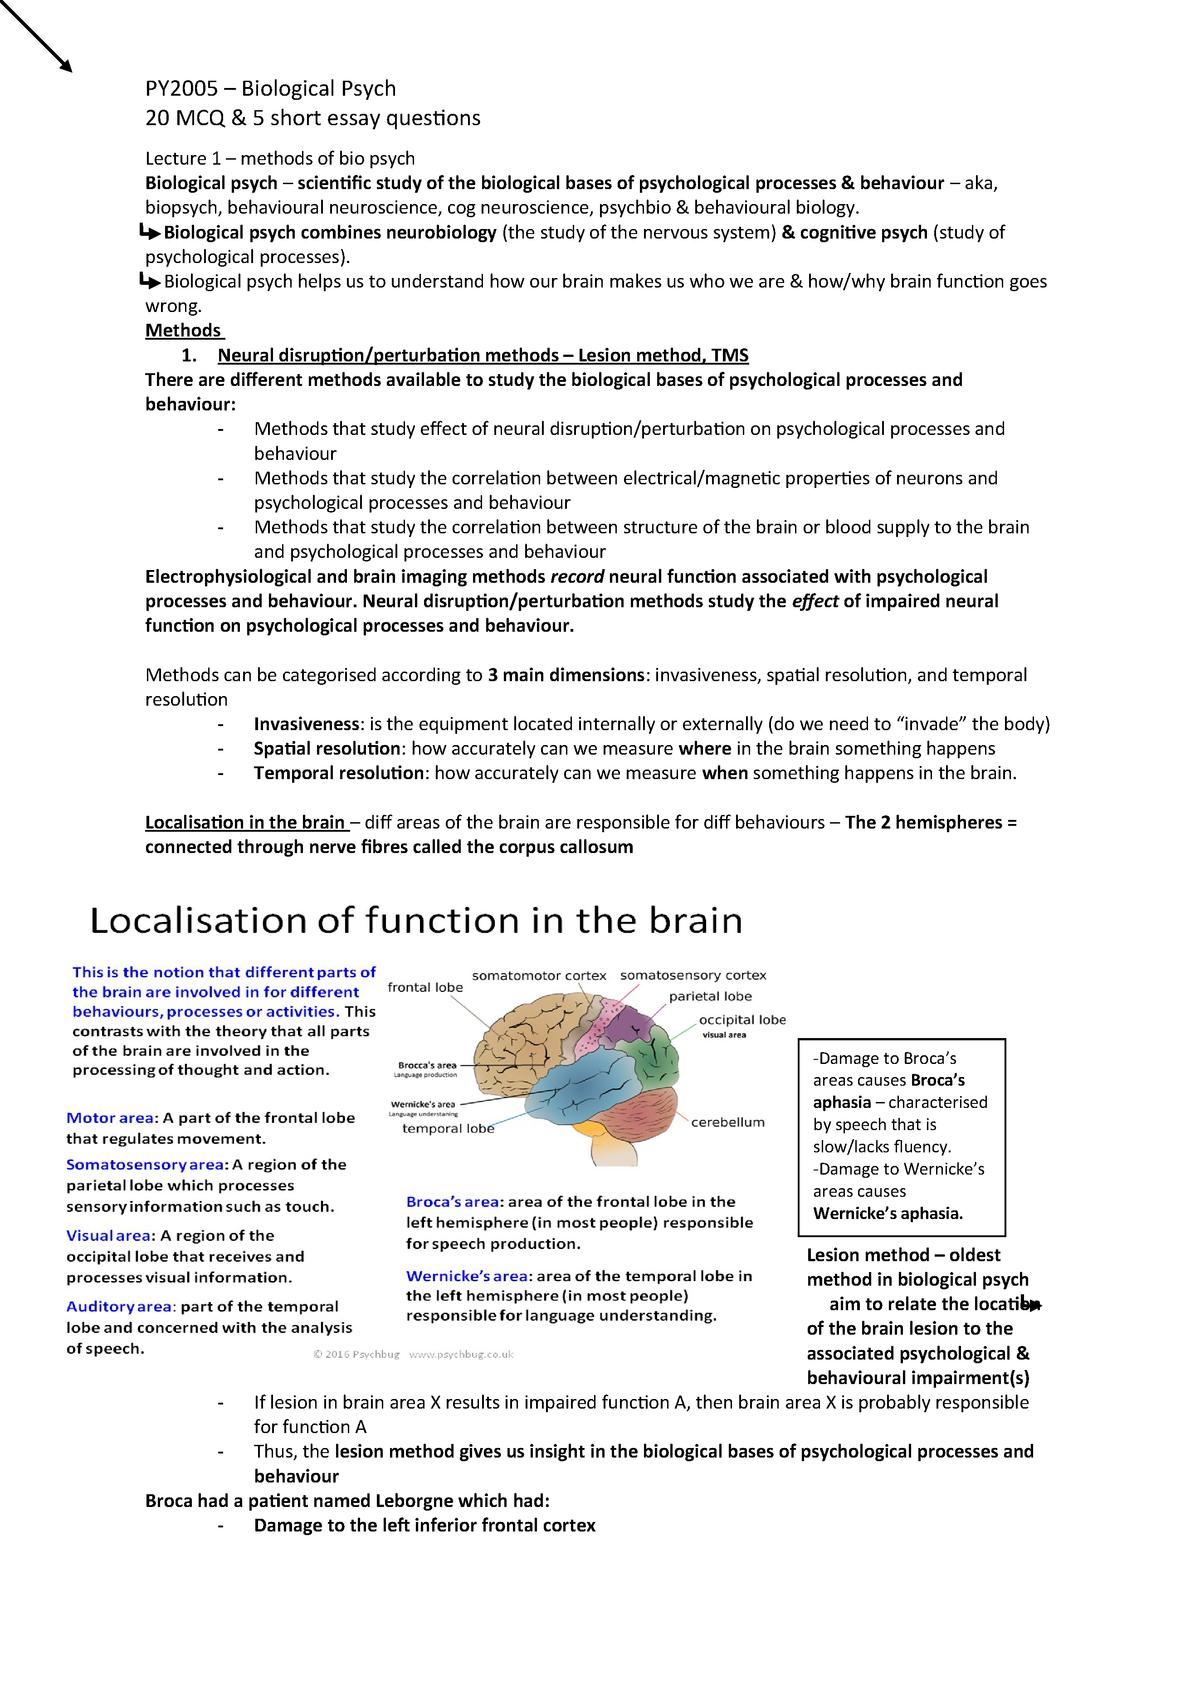 Biological psych - PY5700 - Brunel - StuDocu